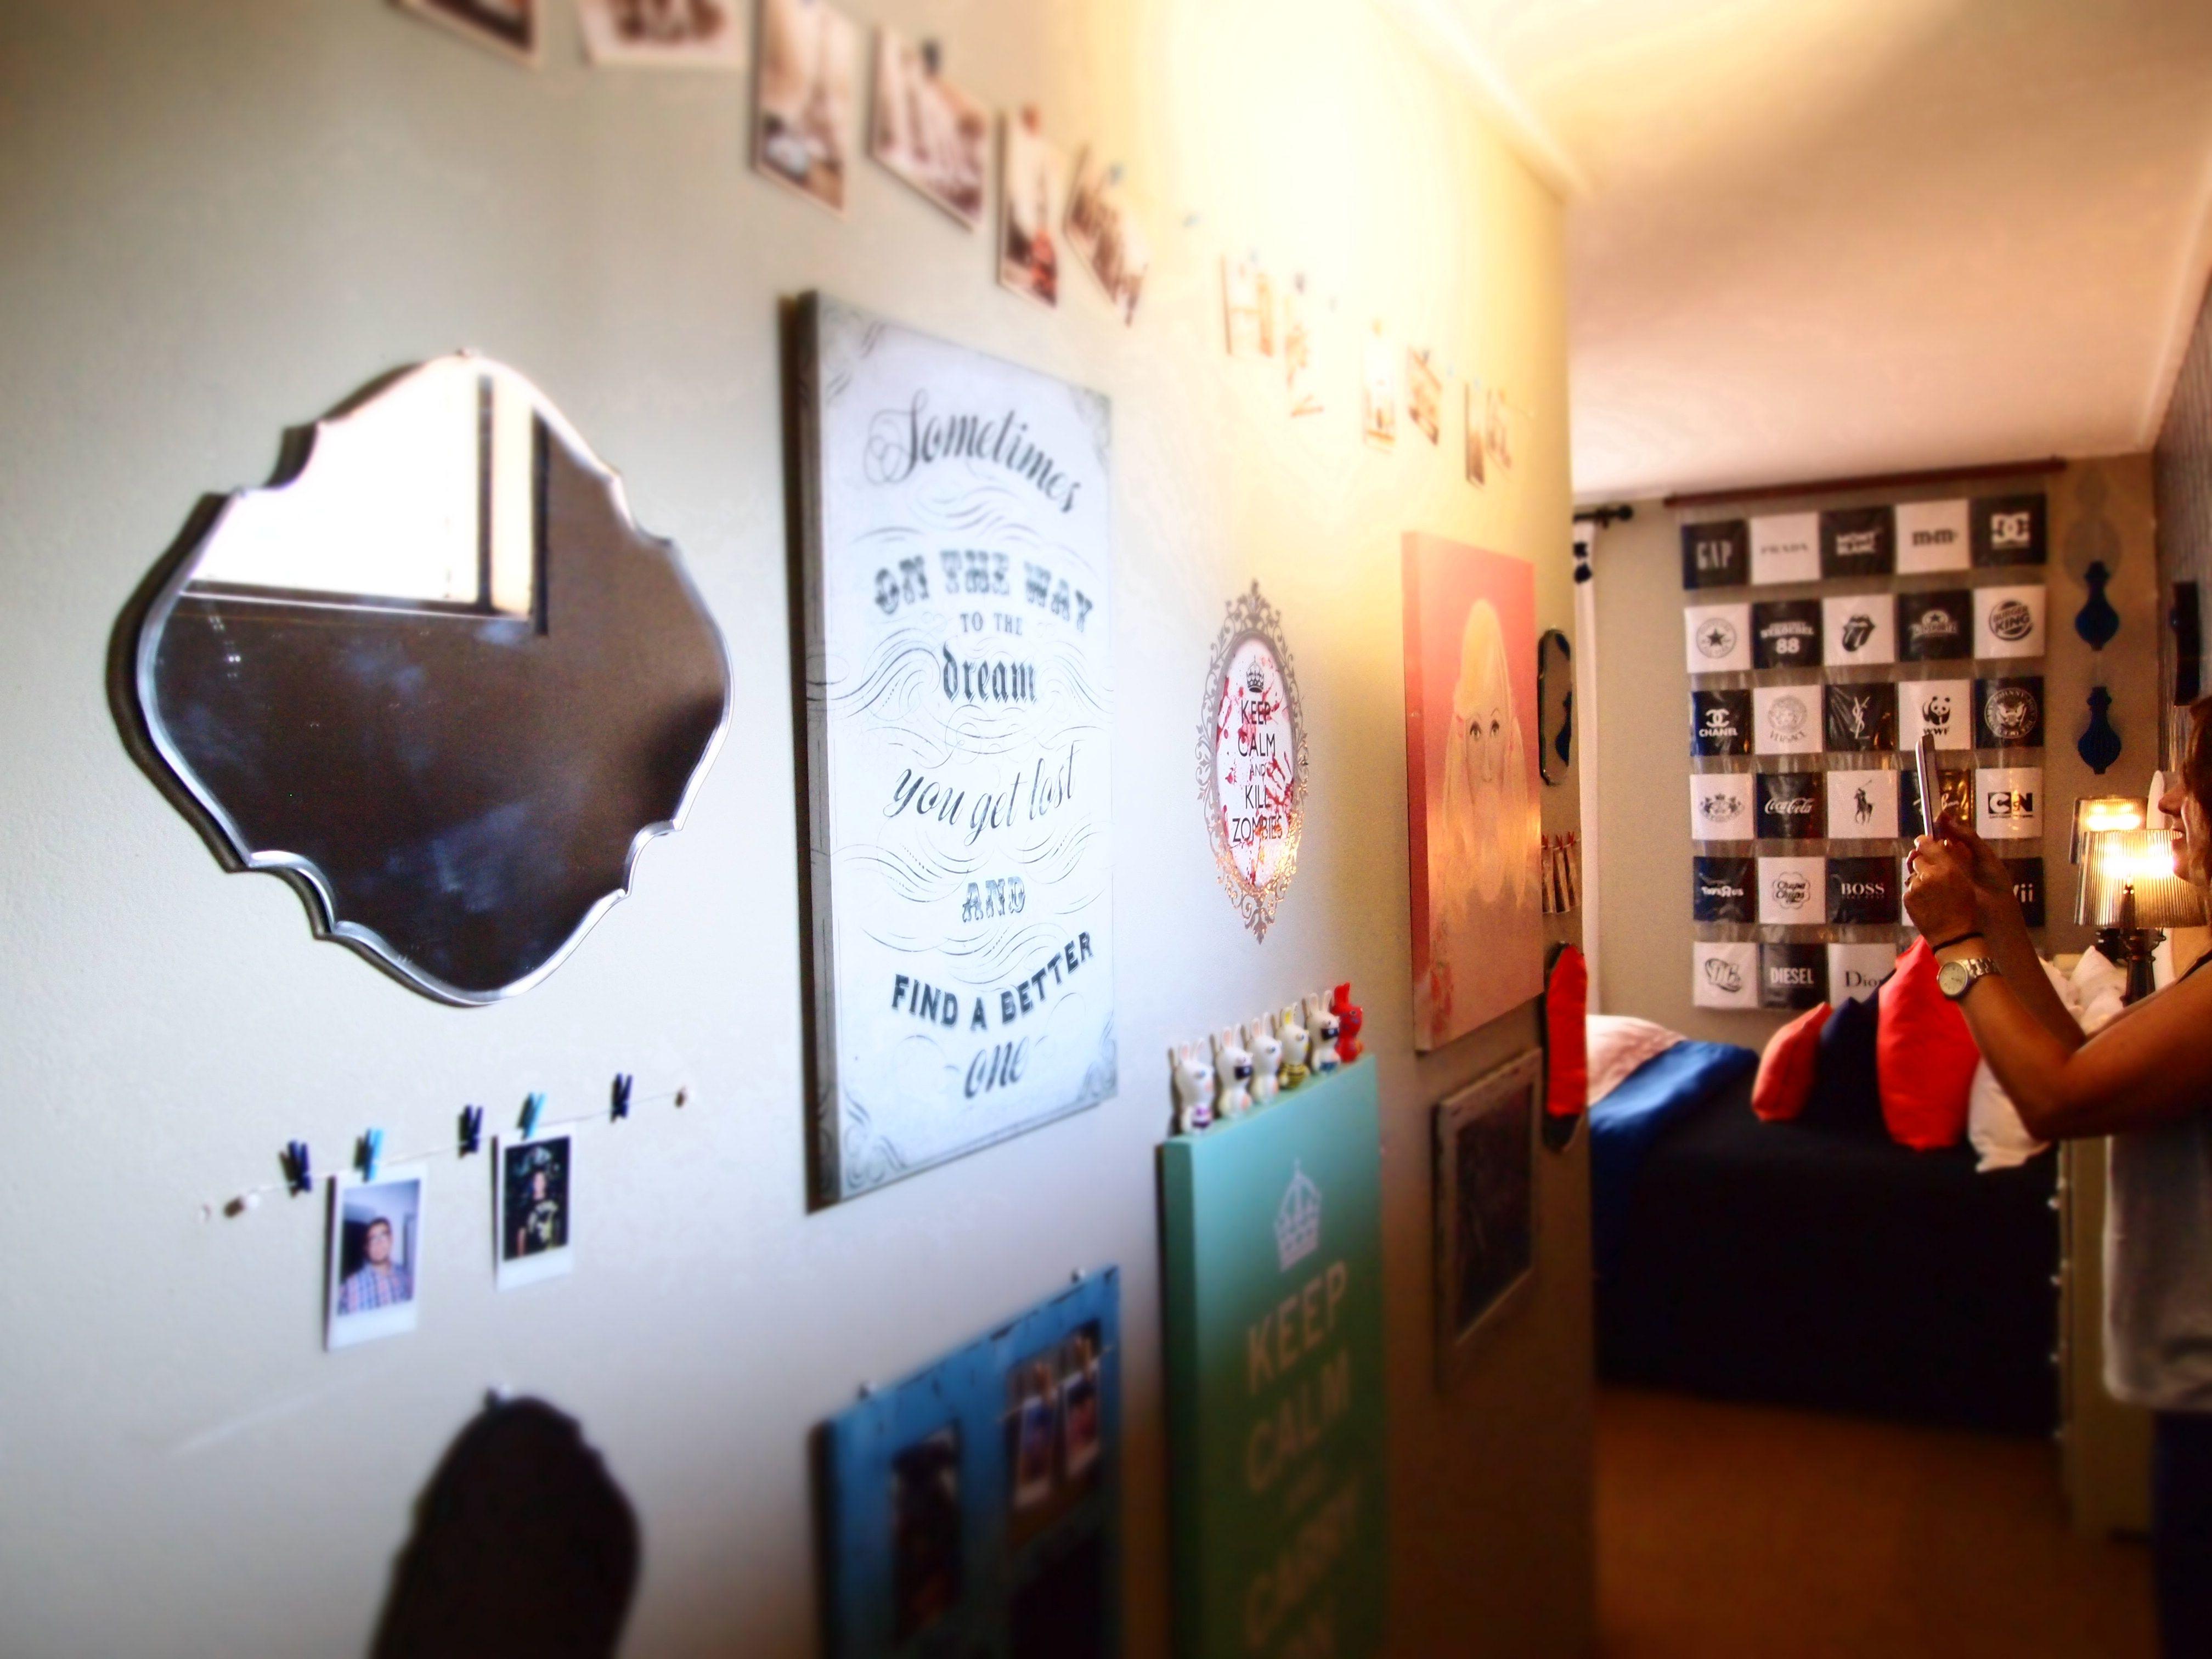 Memoryart wall at entrance of coral u navy teenage bedroom